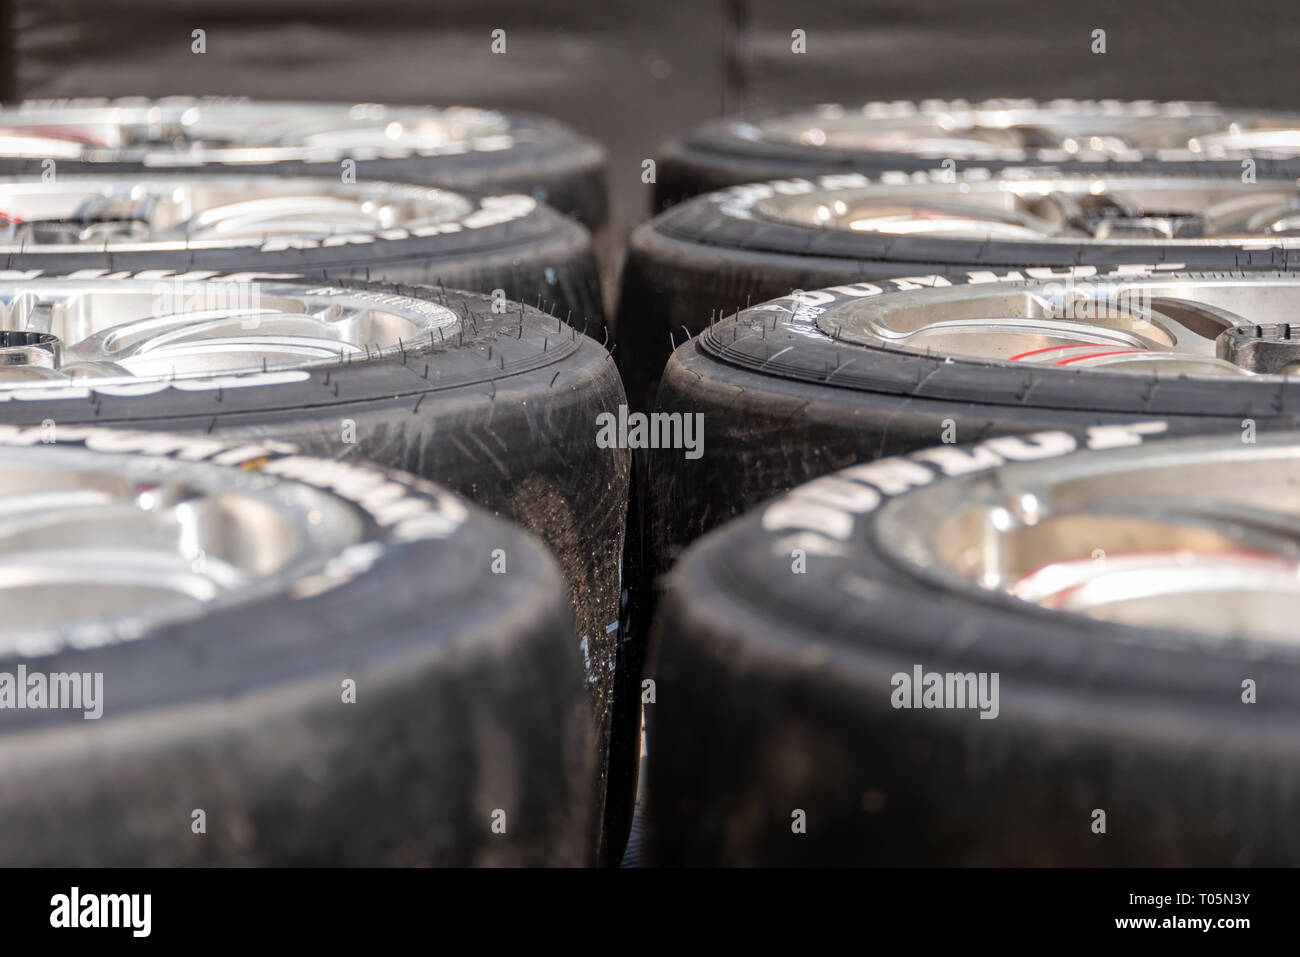 Deux rangées de motor sport racing ready to race Photo Stock